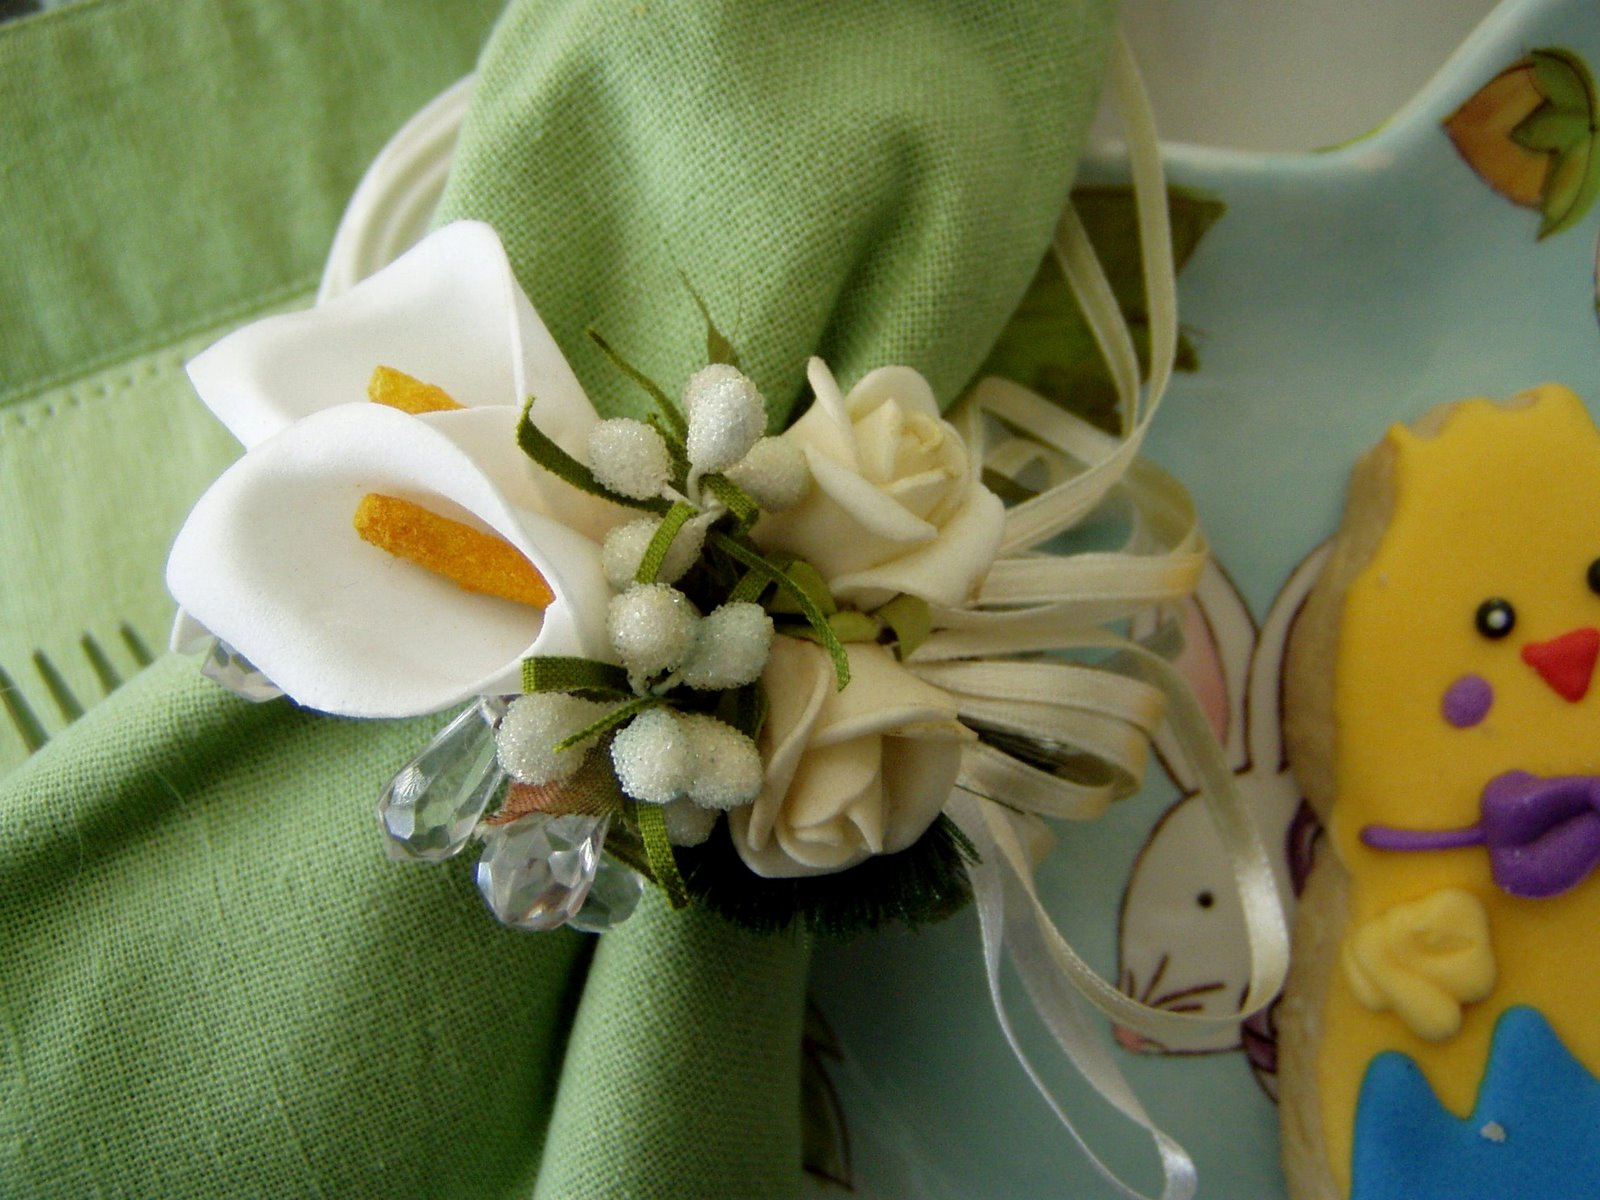 Easter table setting tablescape with bunny centerpiece - Centre de table pour paques ...